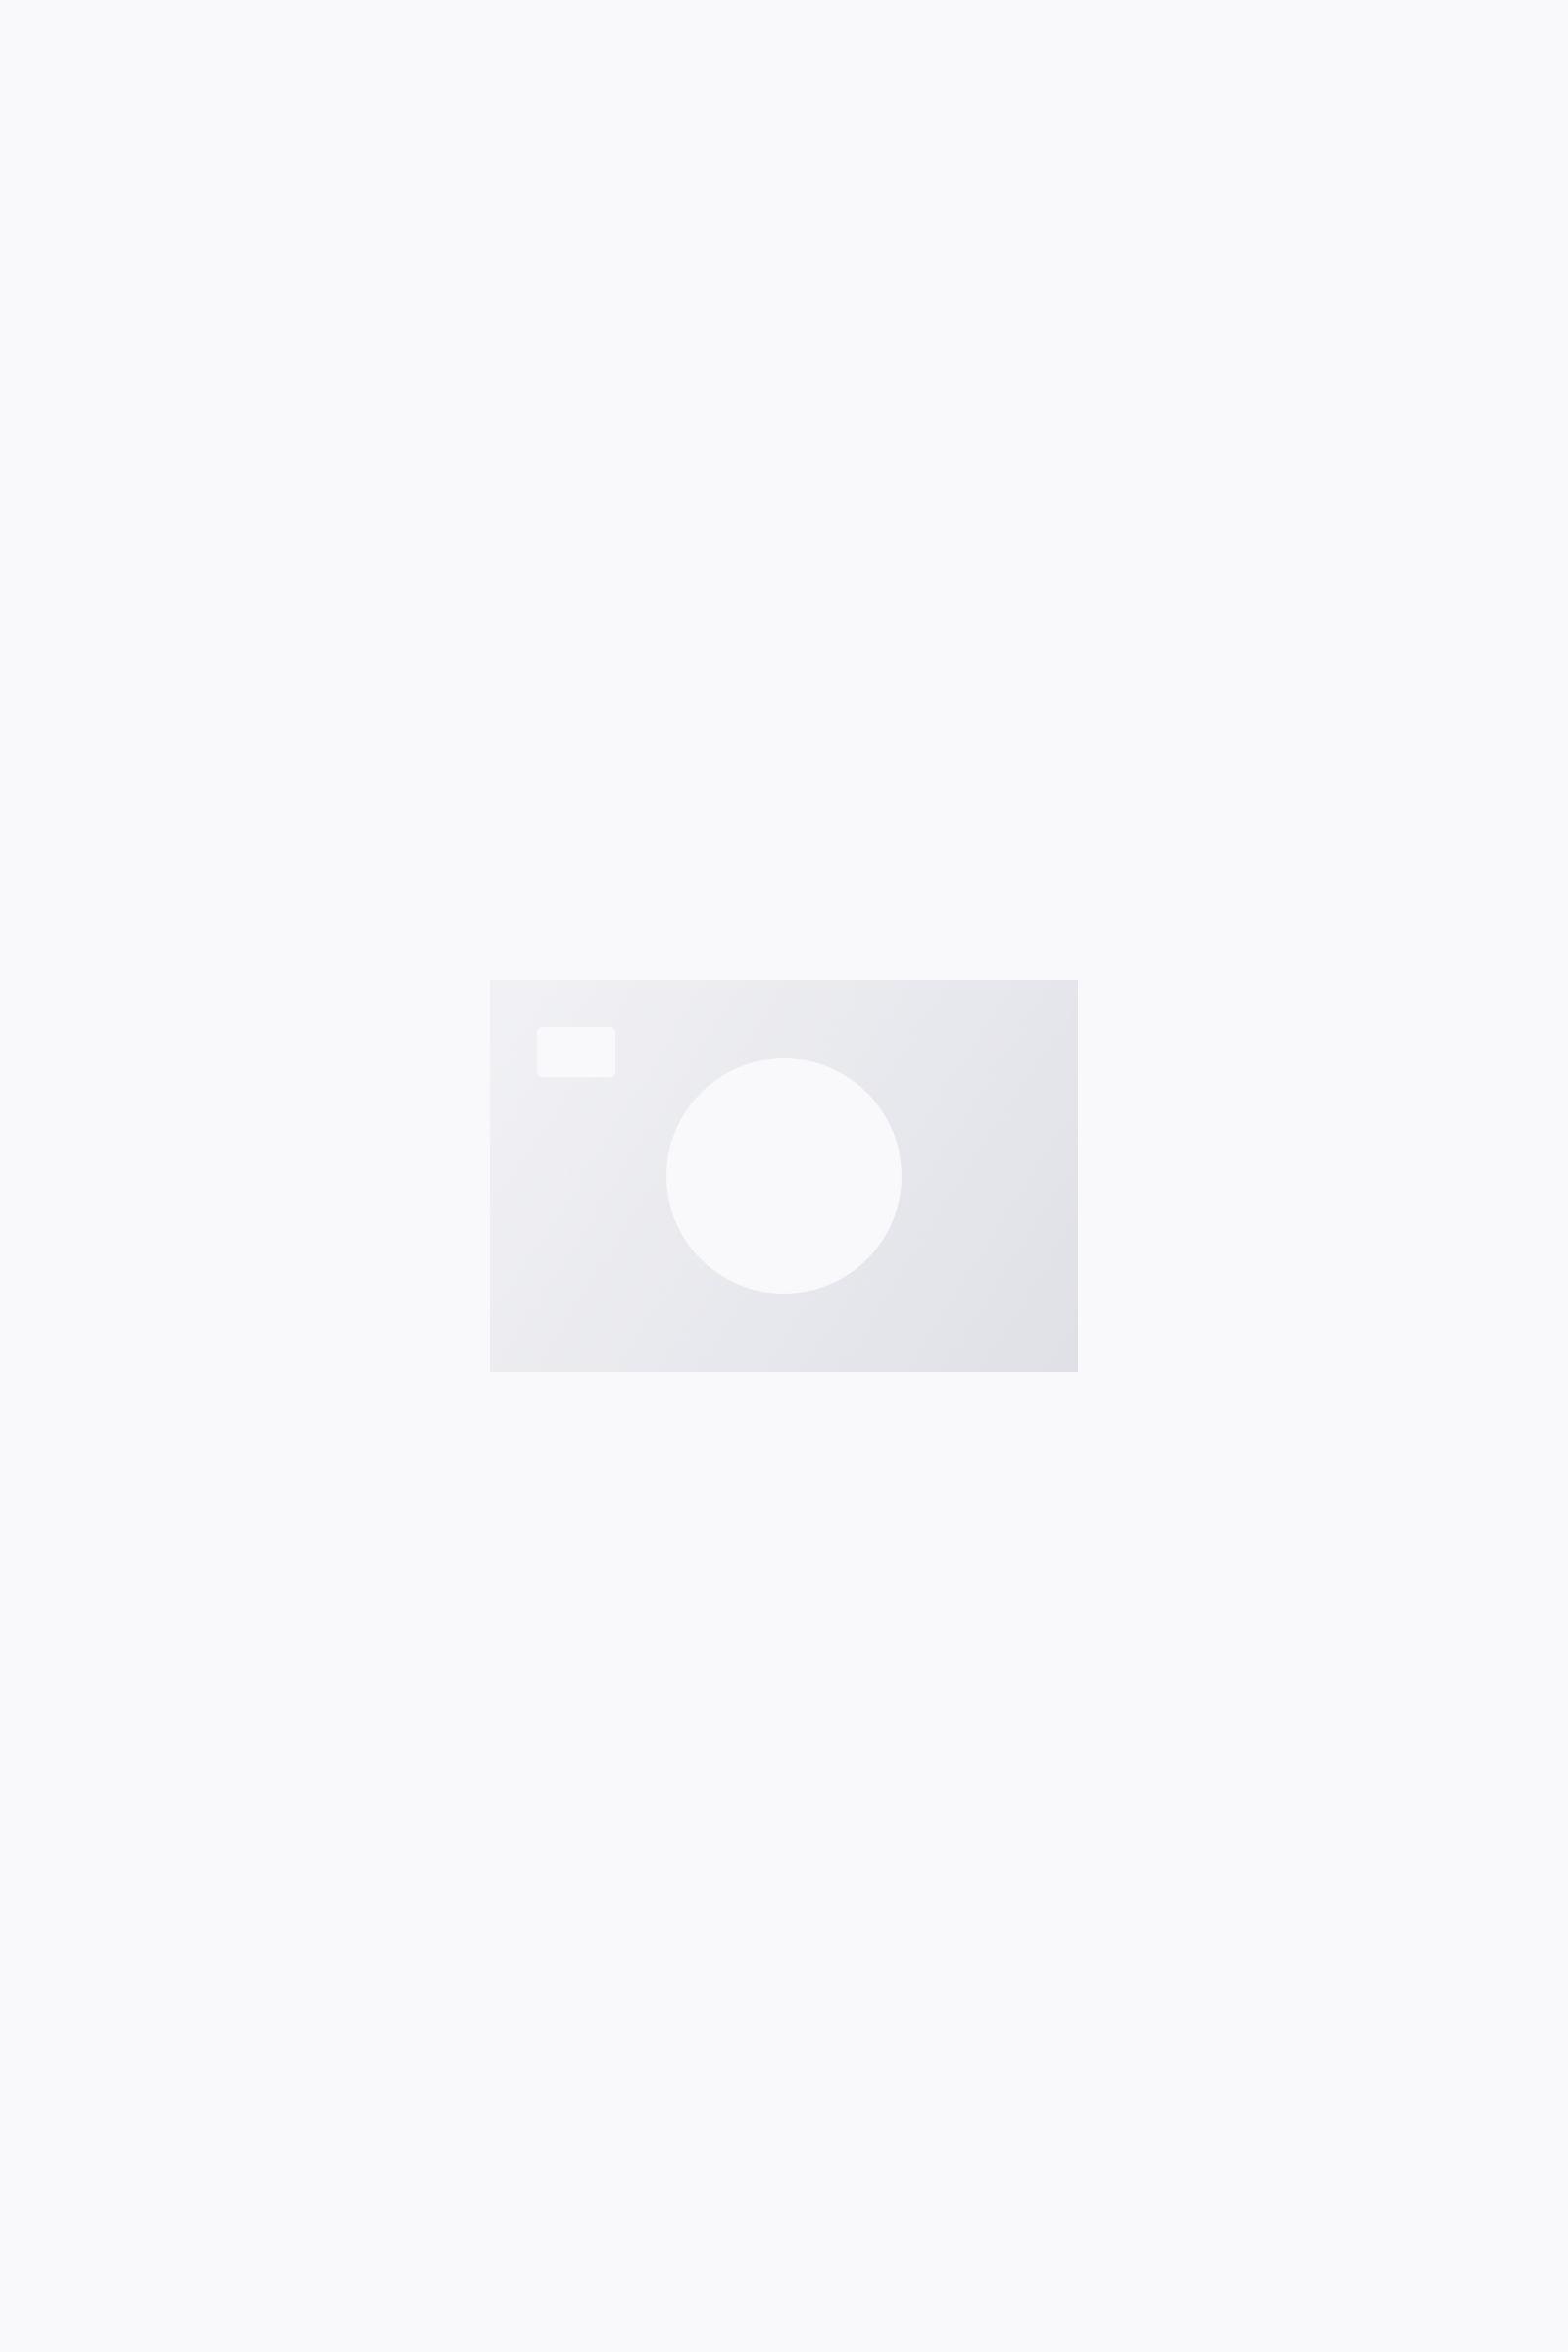 COS PATCH POCKET T-SHIRT,light grey